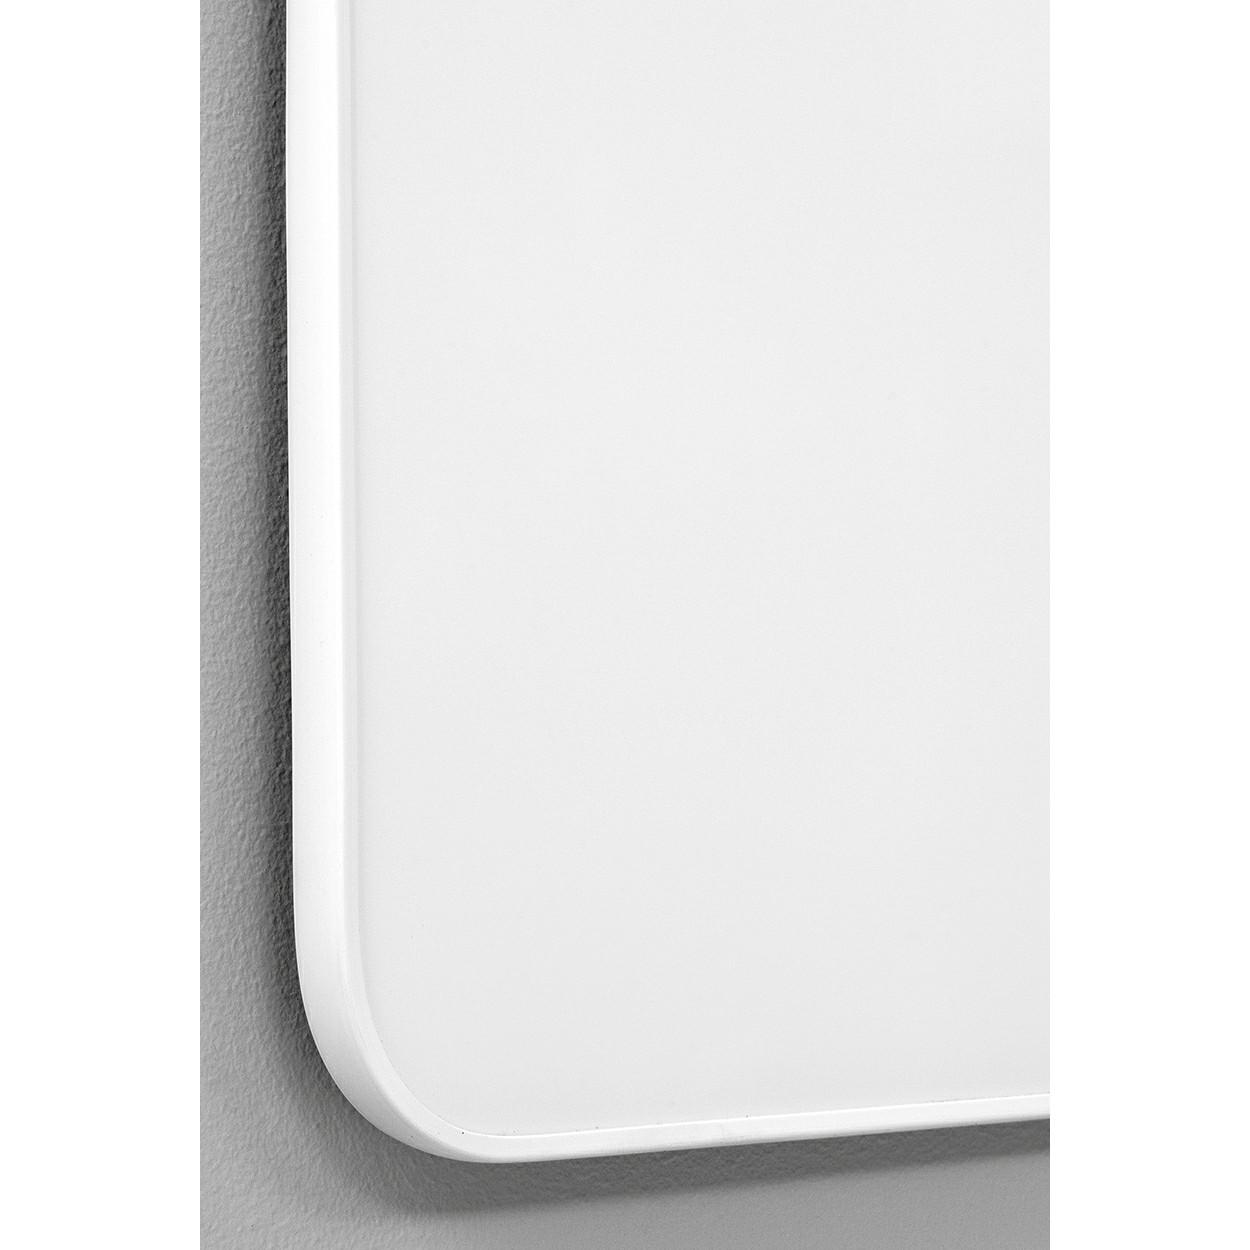 Whiteboard Lintex Edge - med hvid ramme 200 x 120 cm